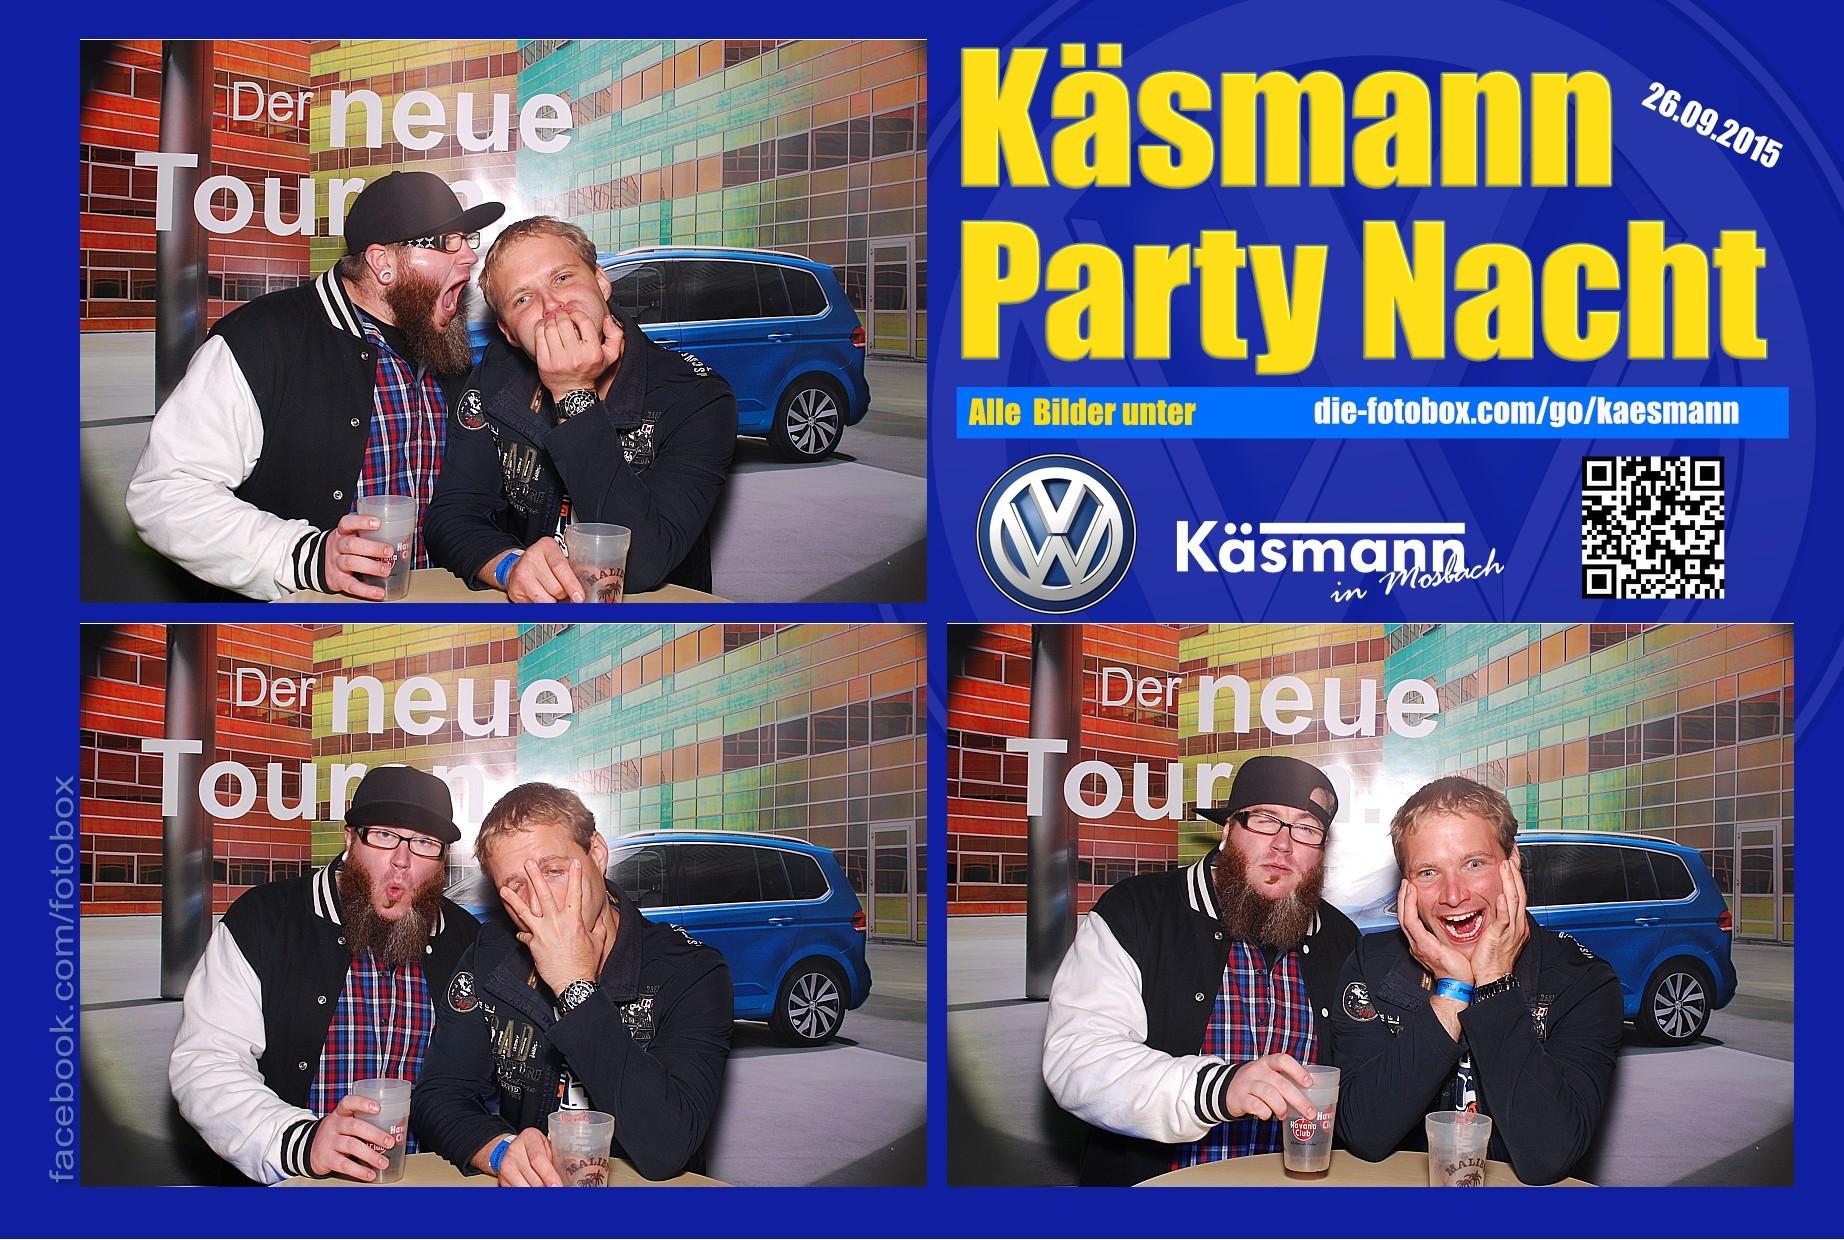 Käsmannparty 2015 - www.die-fotobox.com 01247